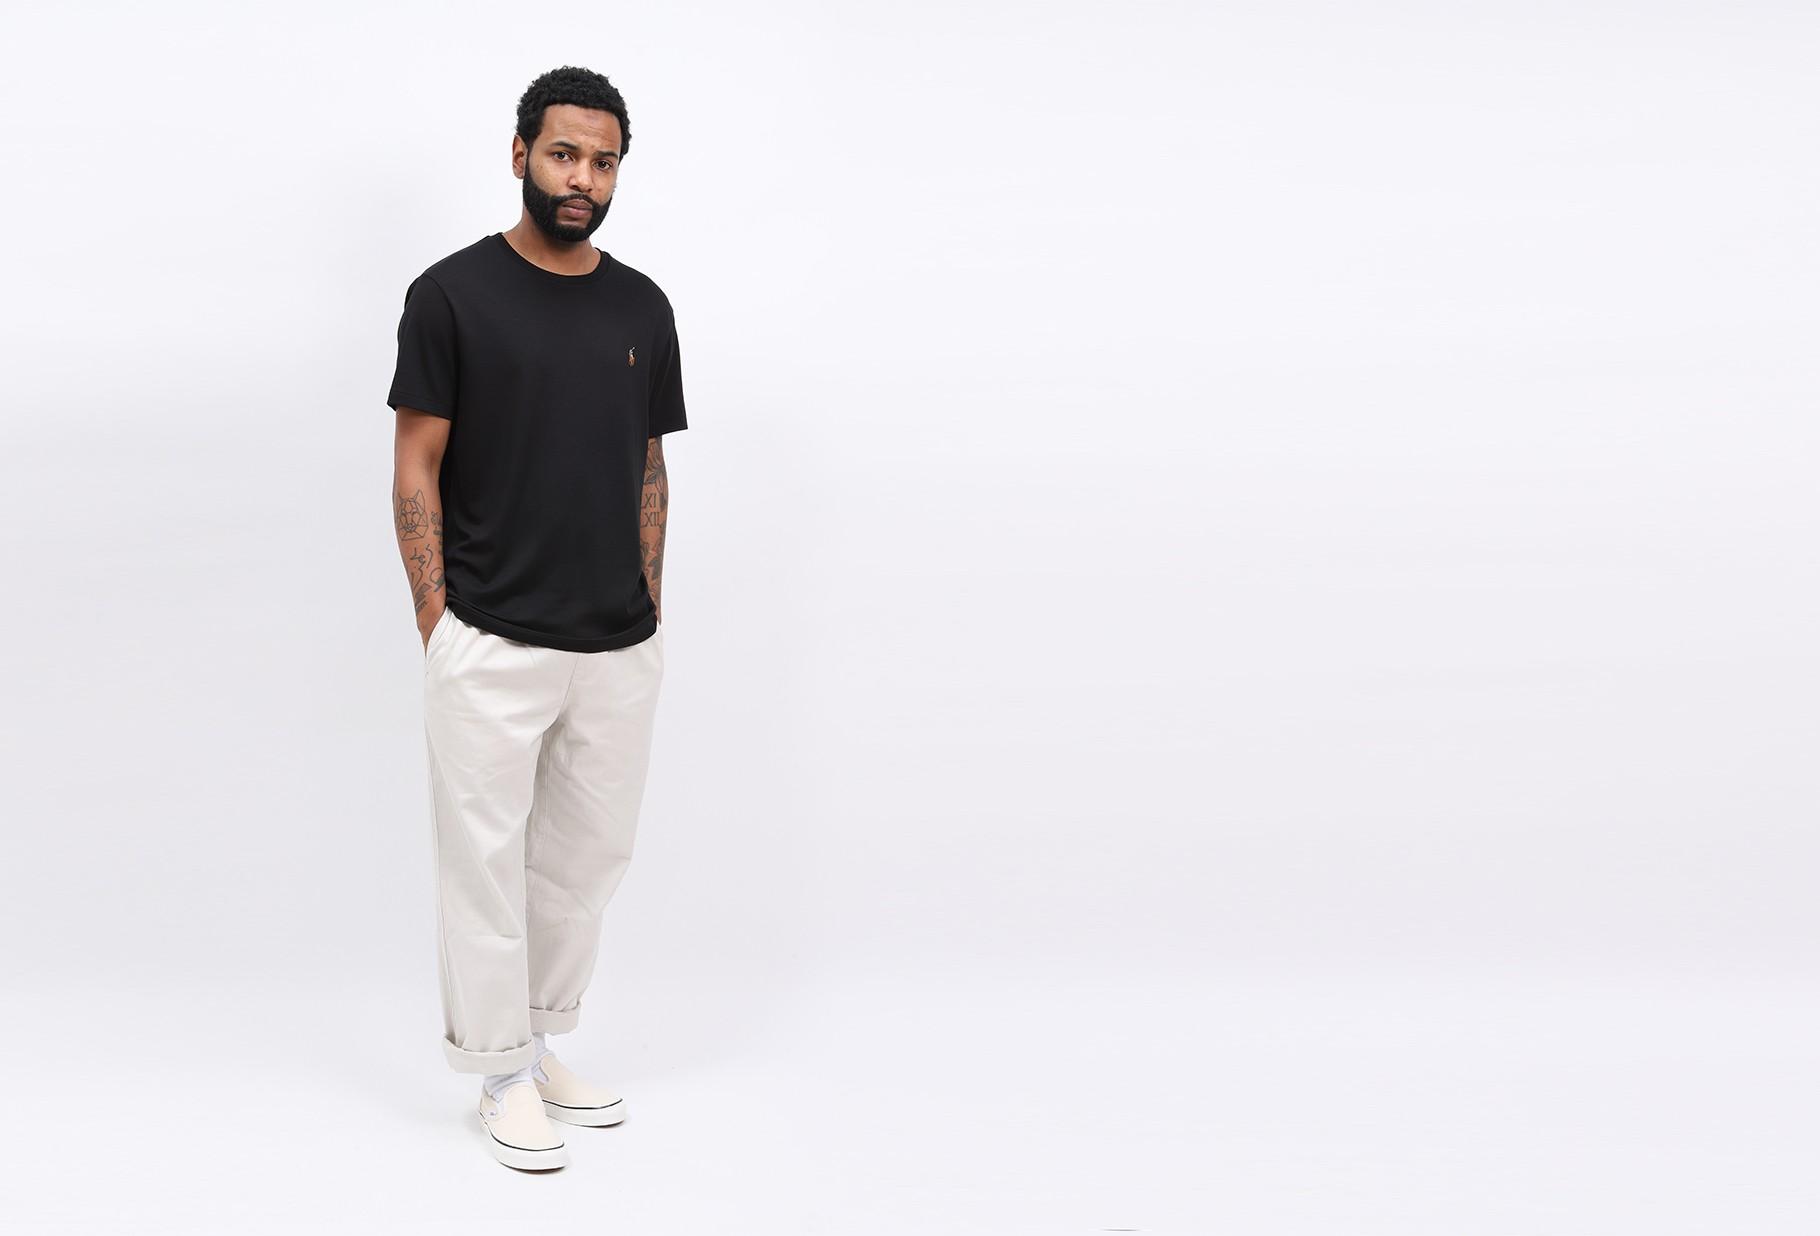 POLO RALPH LAUREN / Custom slim fit tee shirt Black